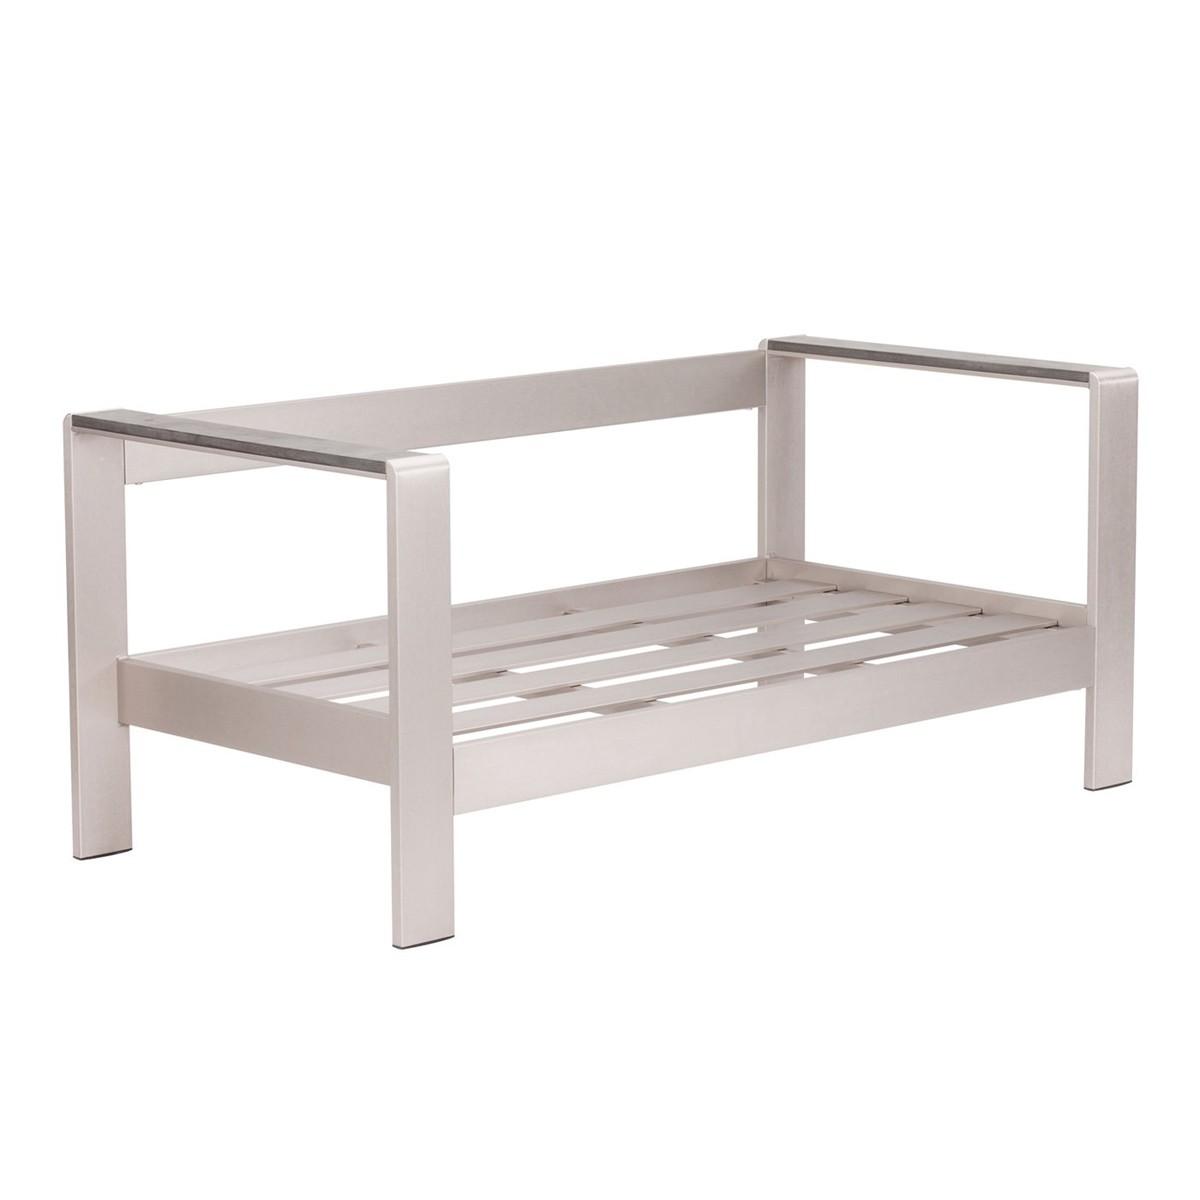 Zuo Modern Cosmopolitan Sofa Frame - Brushed Aluminum